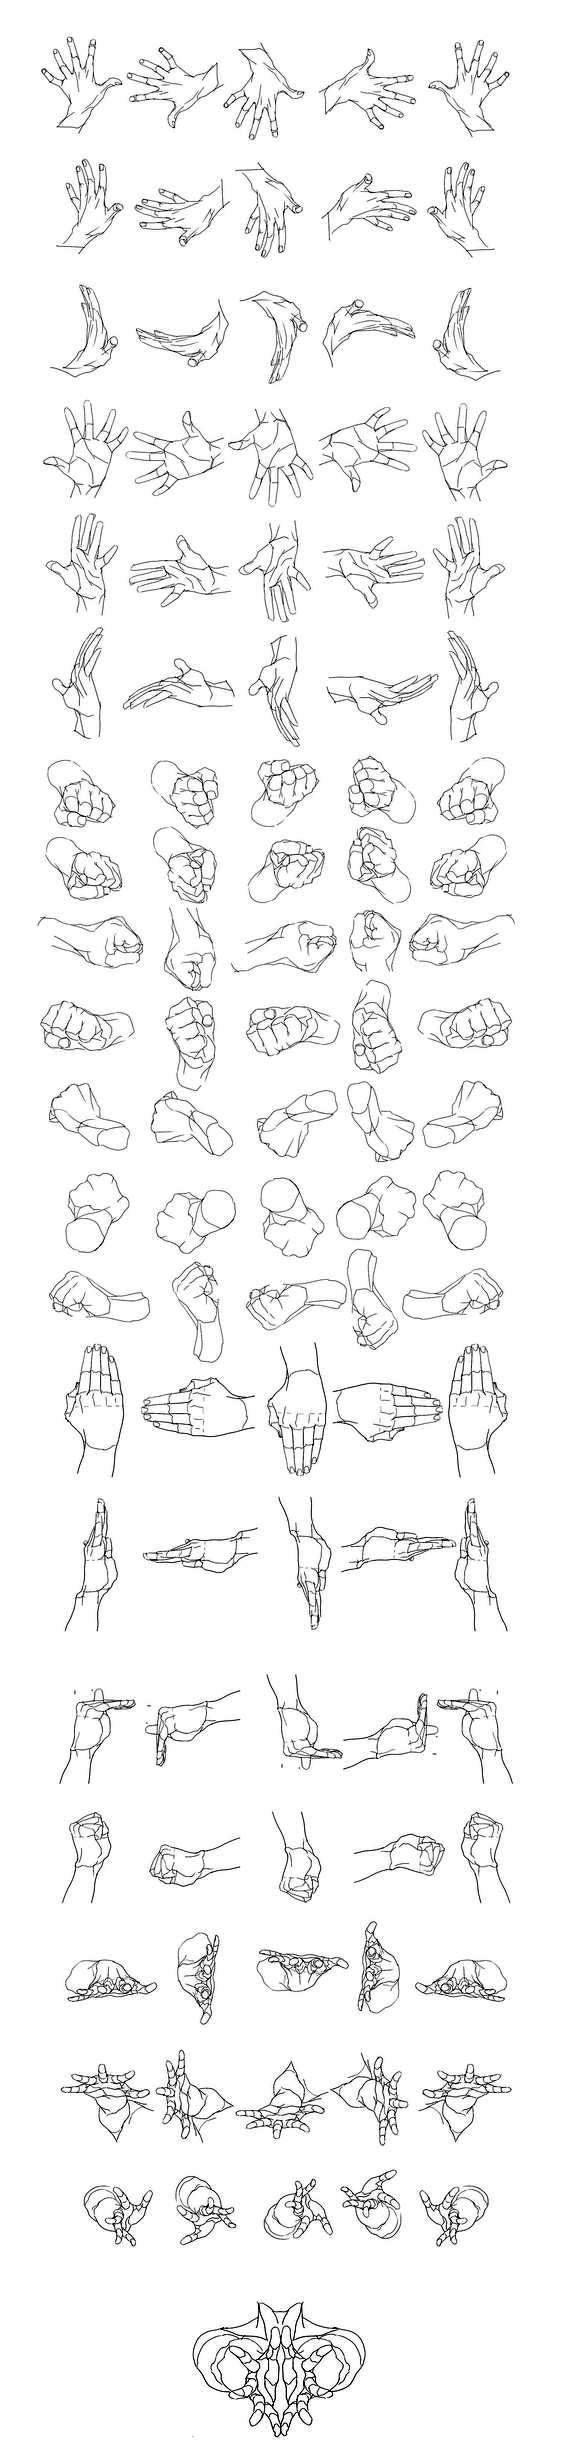 Character Anatomy Hands_2 (564x2460)